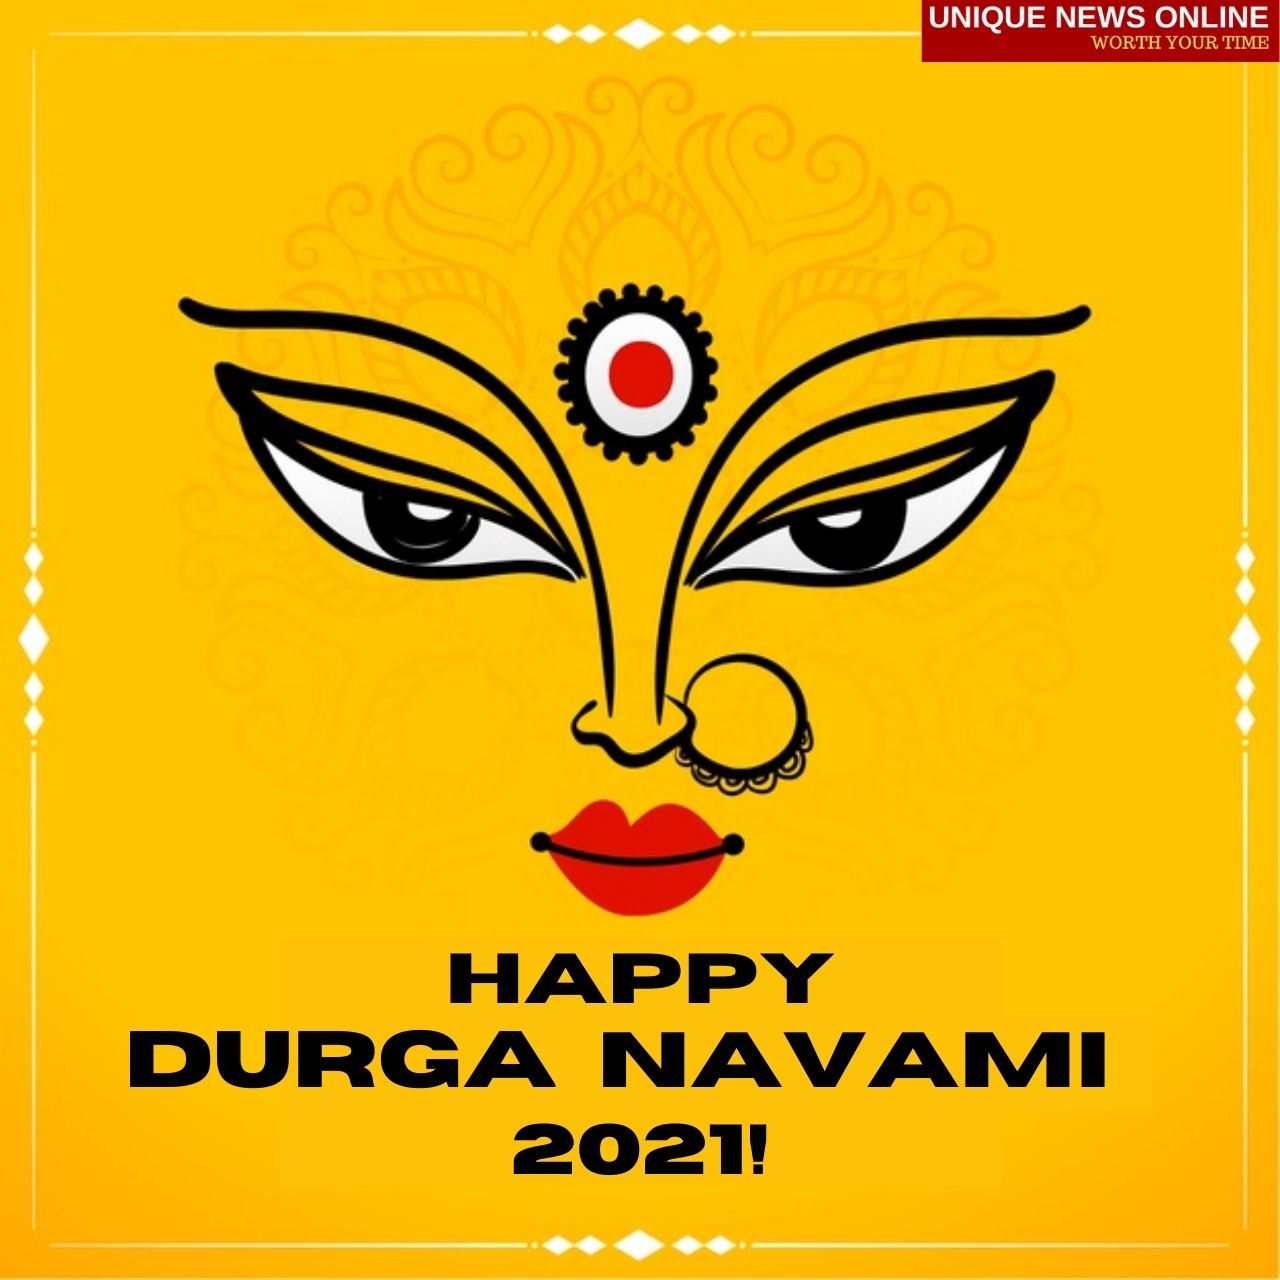 Durga Navami 2021 WhatsApp Status Video to Download